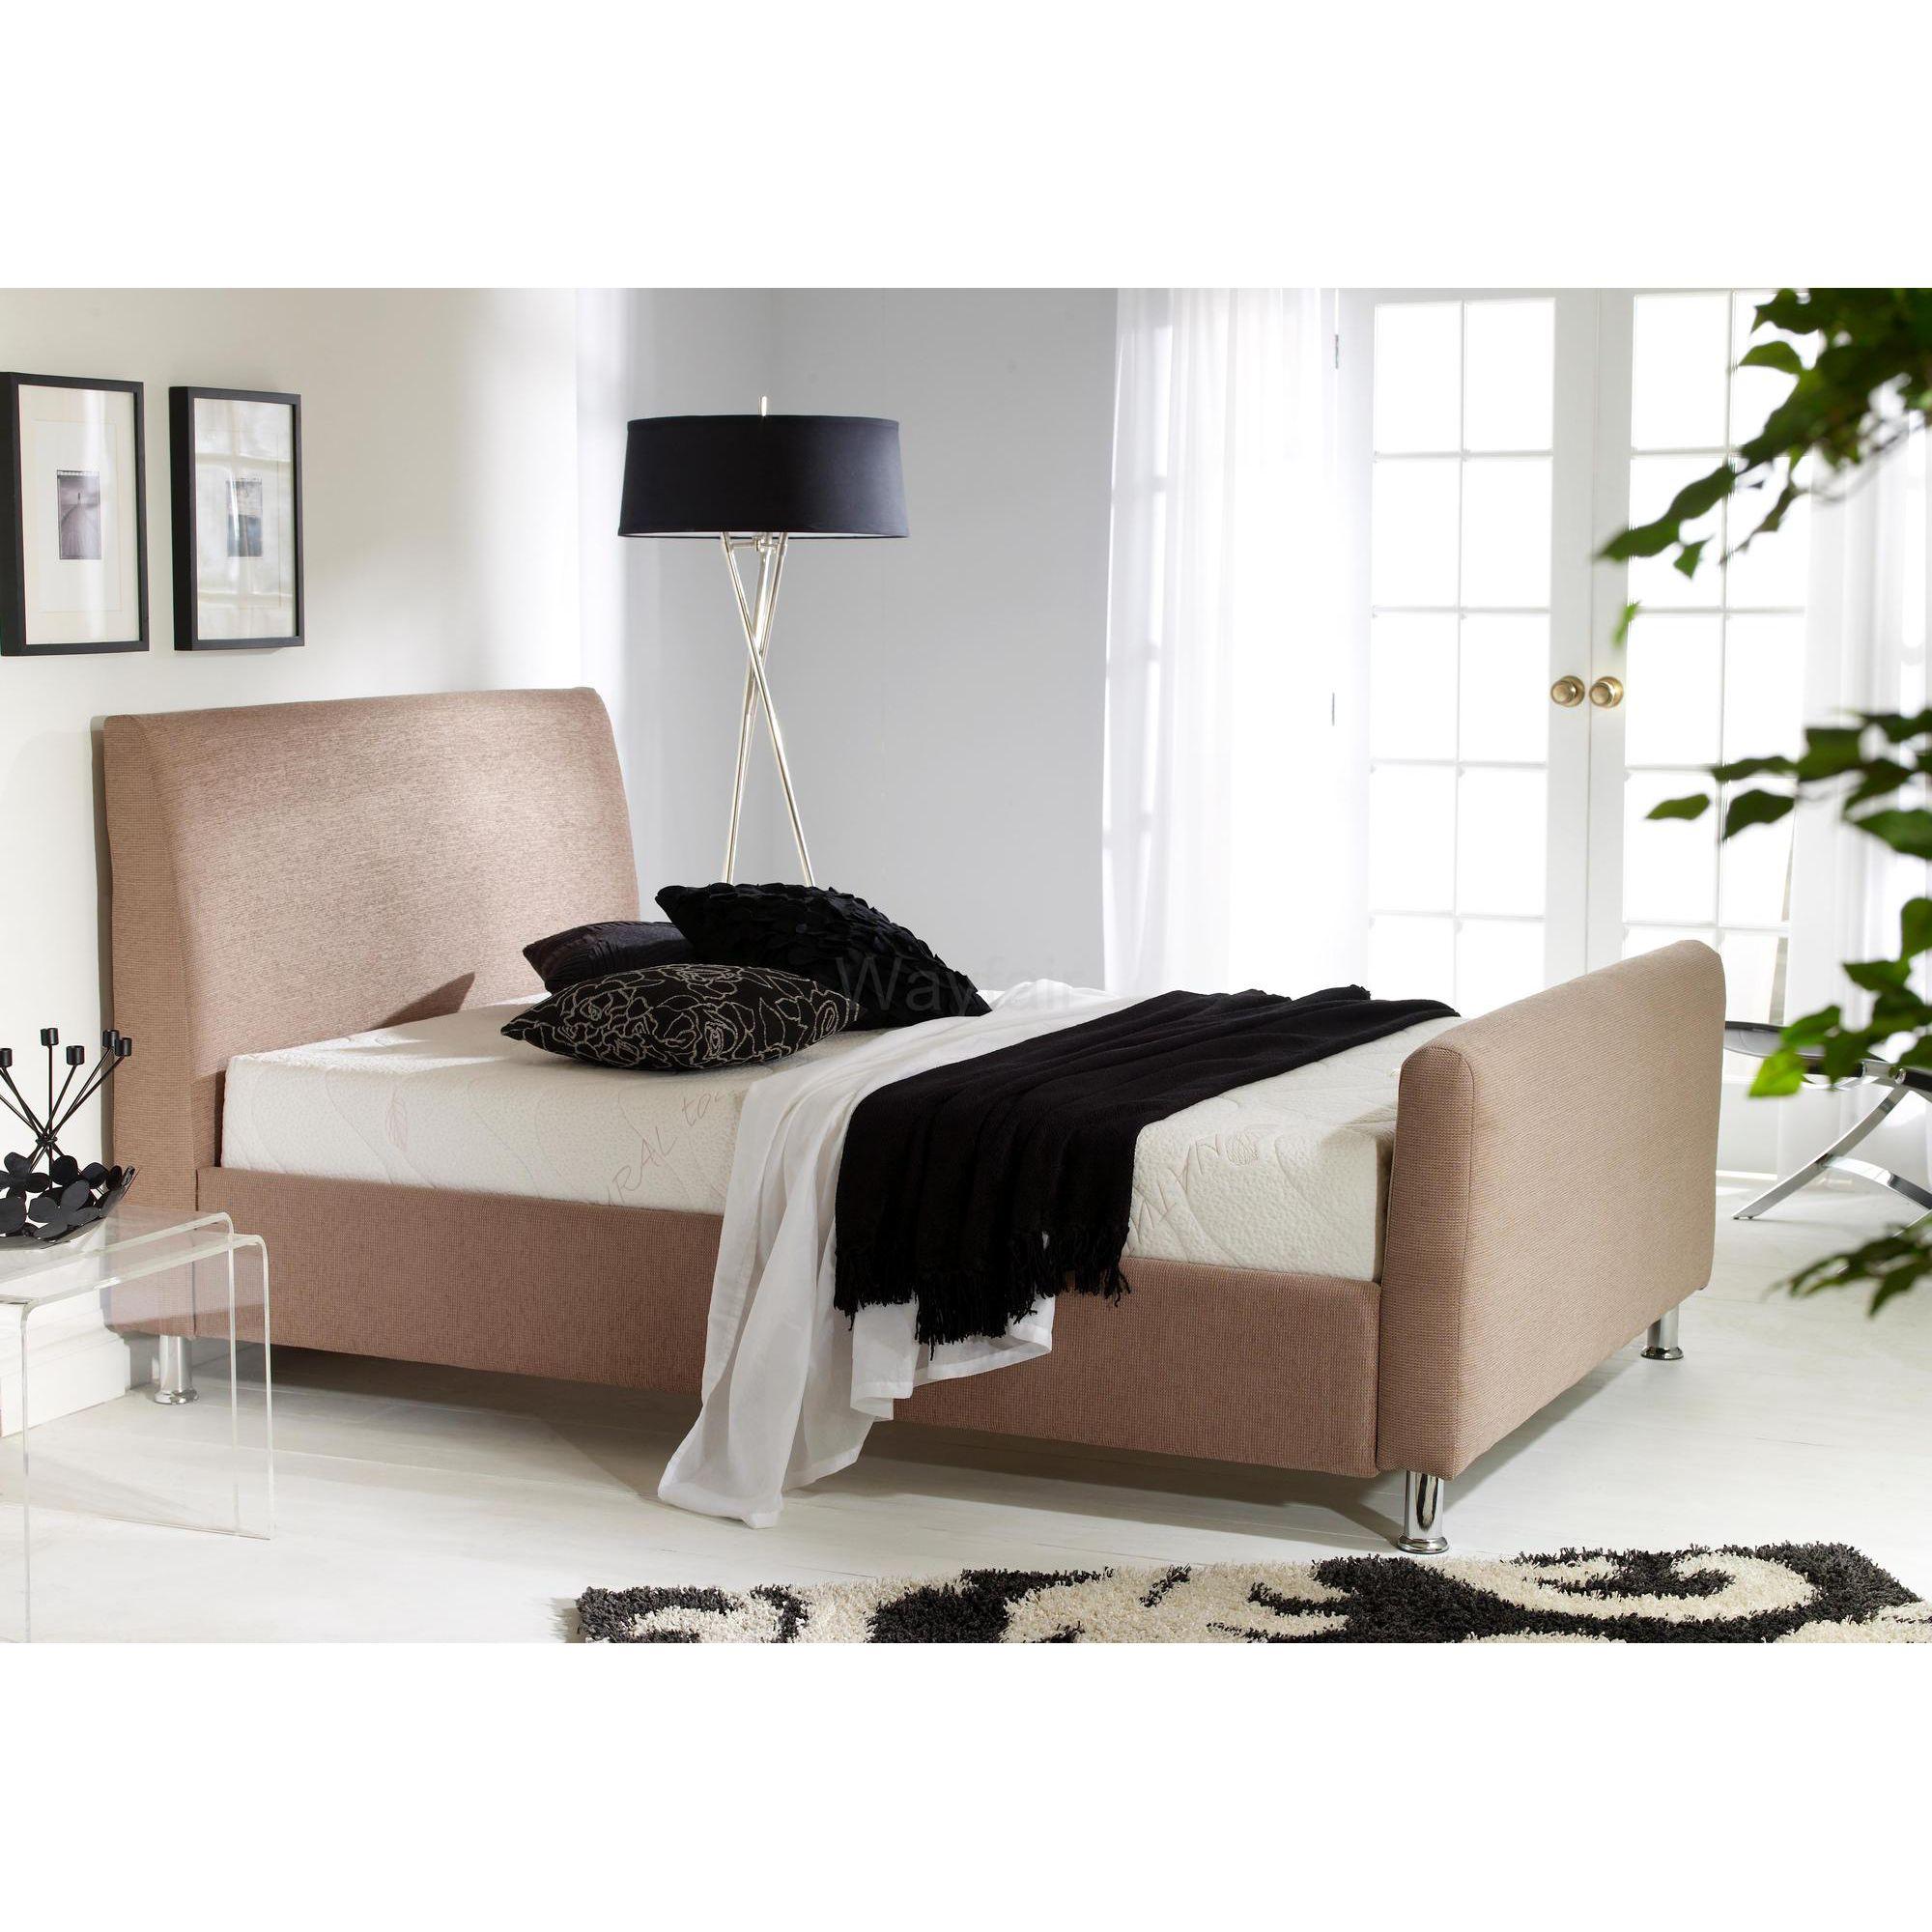 MA Living Kamli Bed - Single - faux leather Black at Tesco Direct